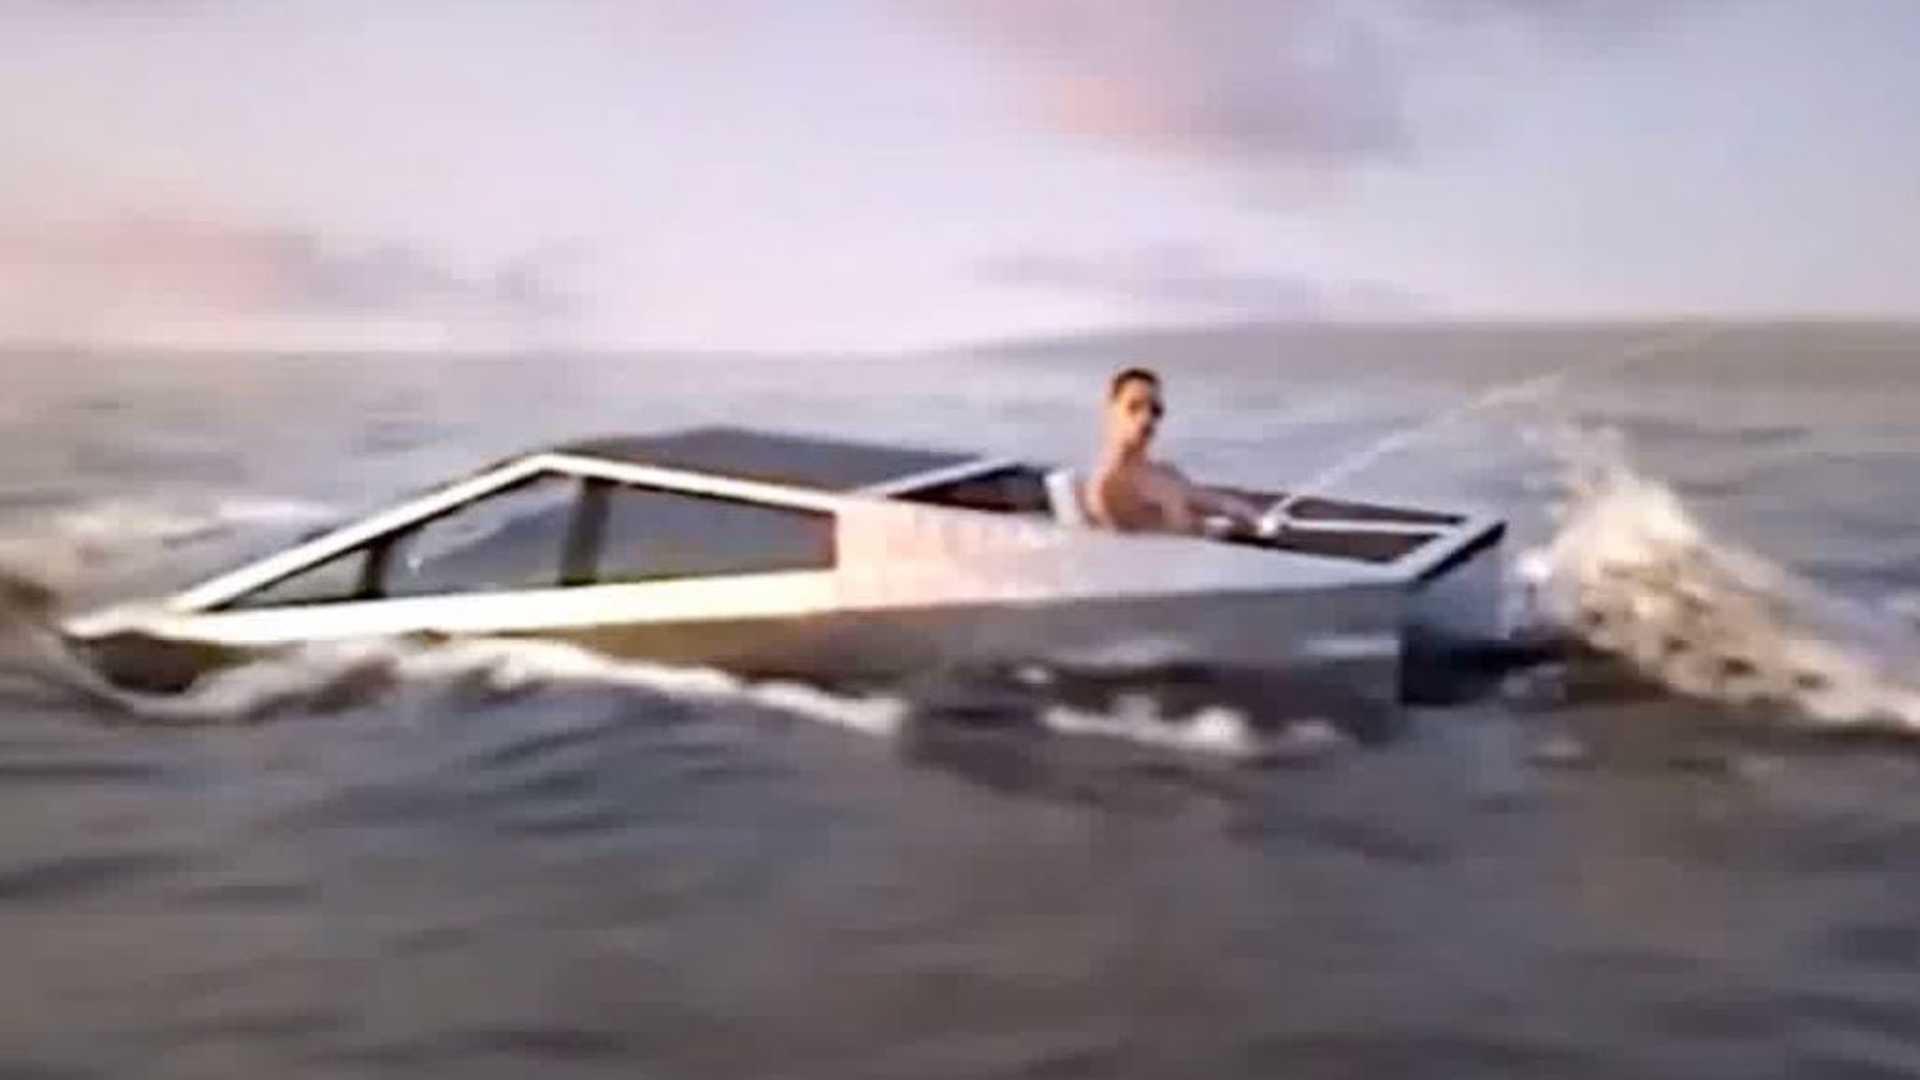 Watch Tesla Cybertruck Ride The Waves In Slick New Fishing Video